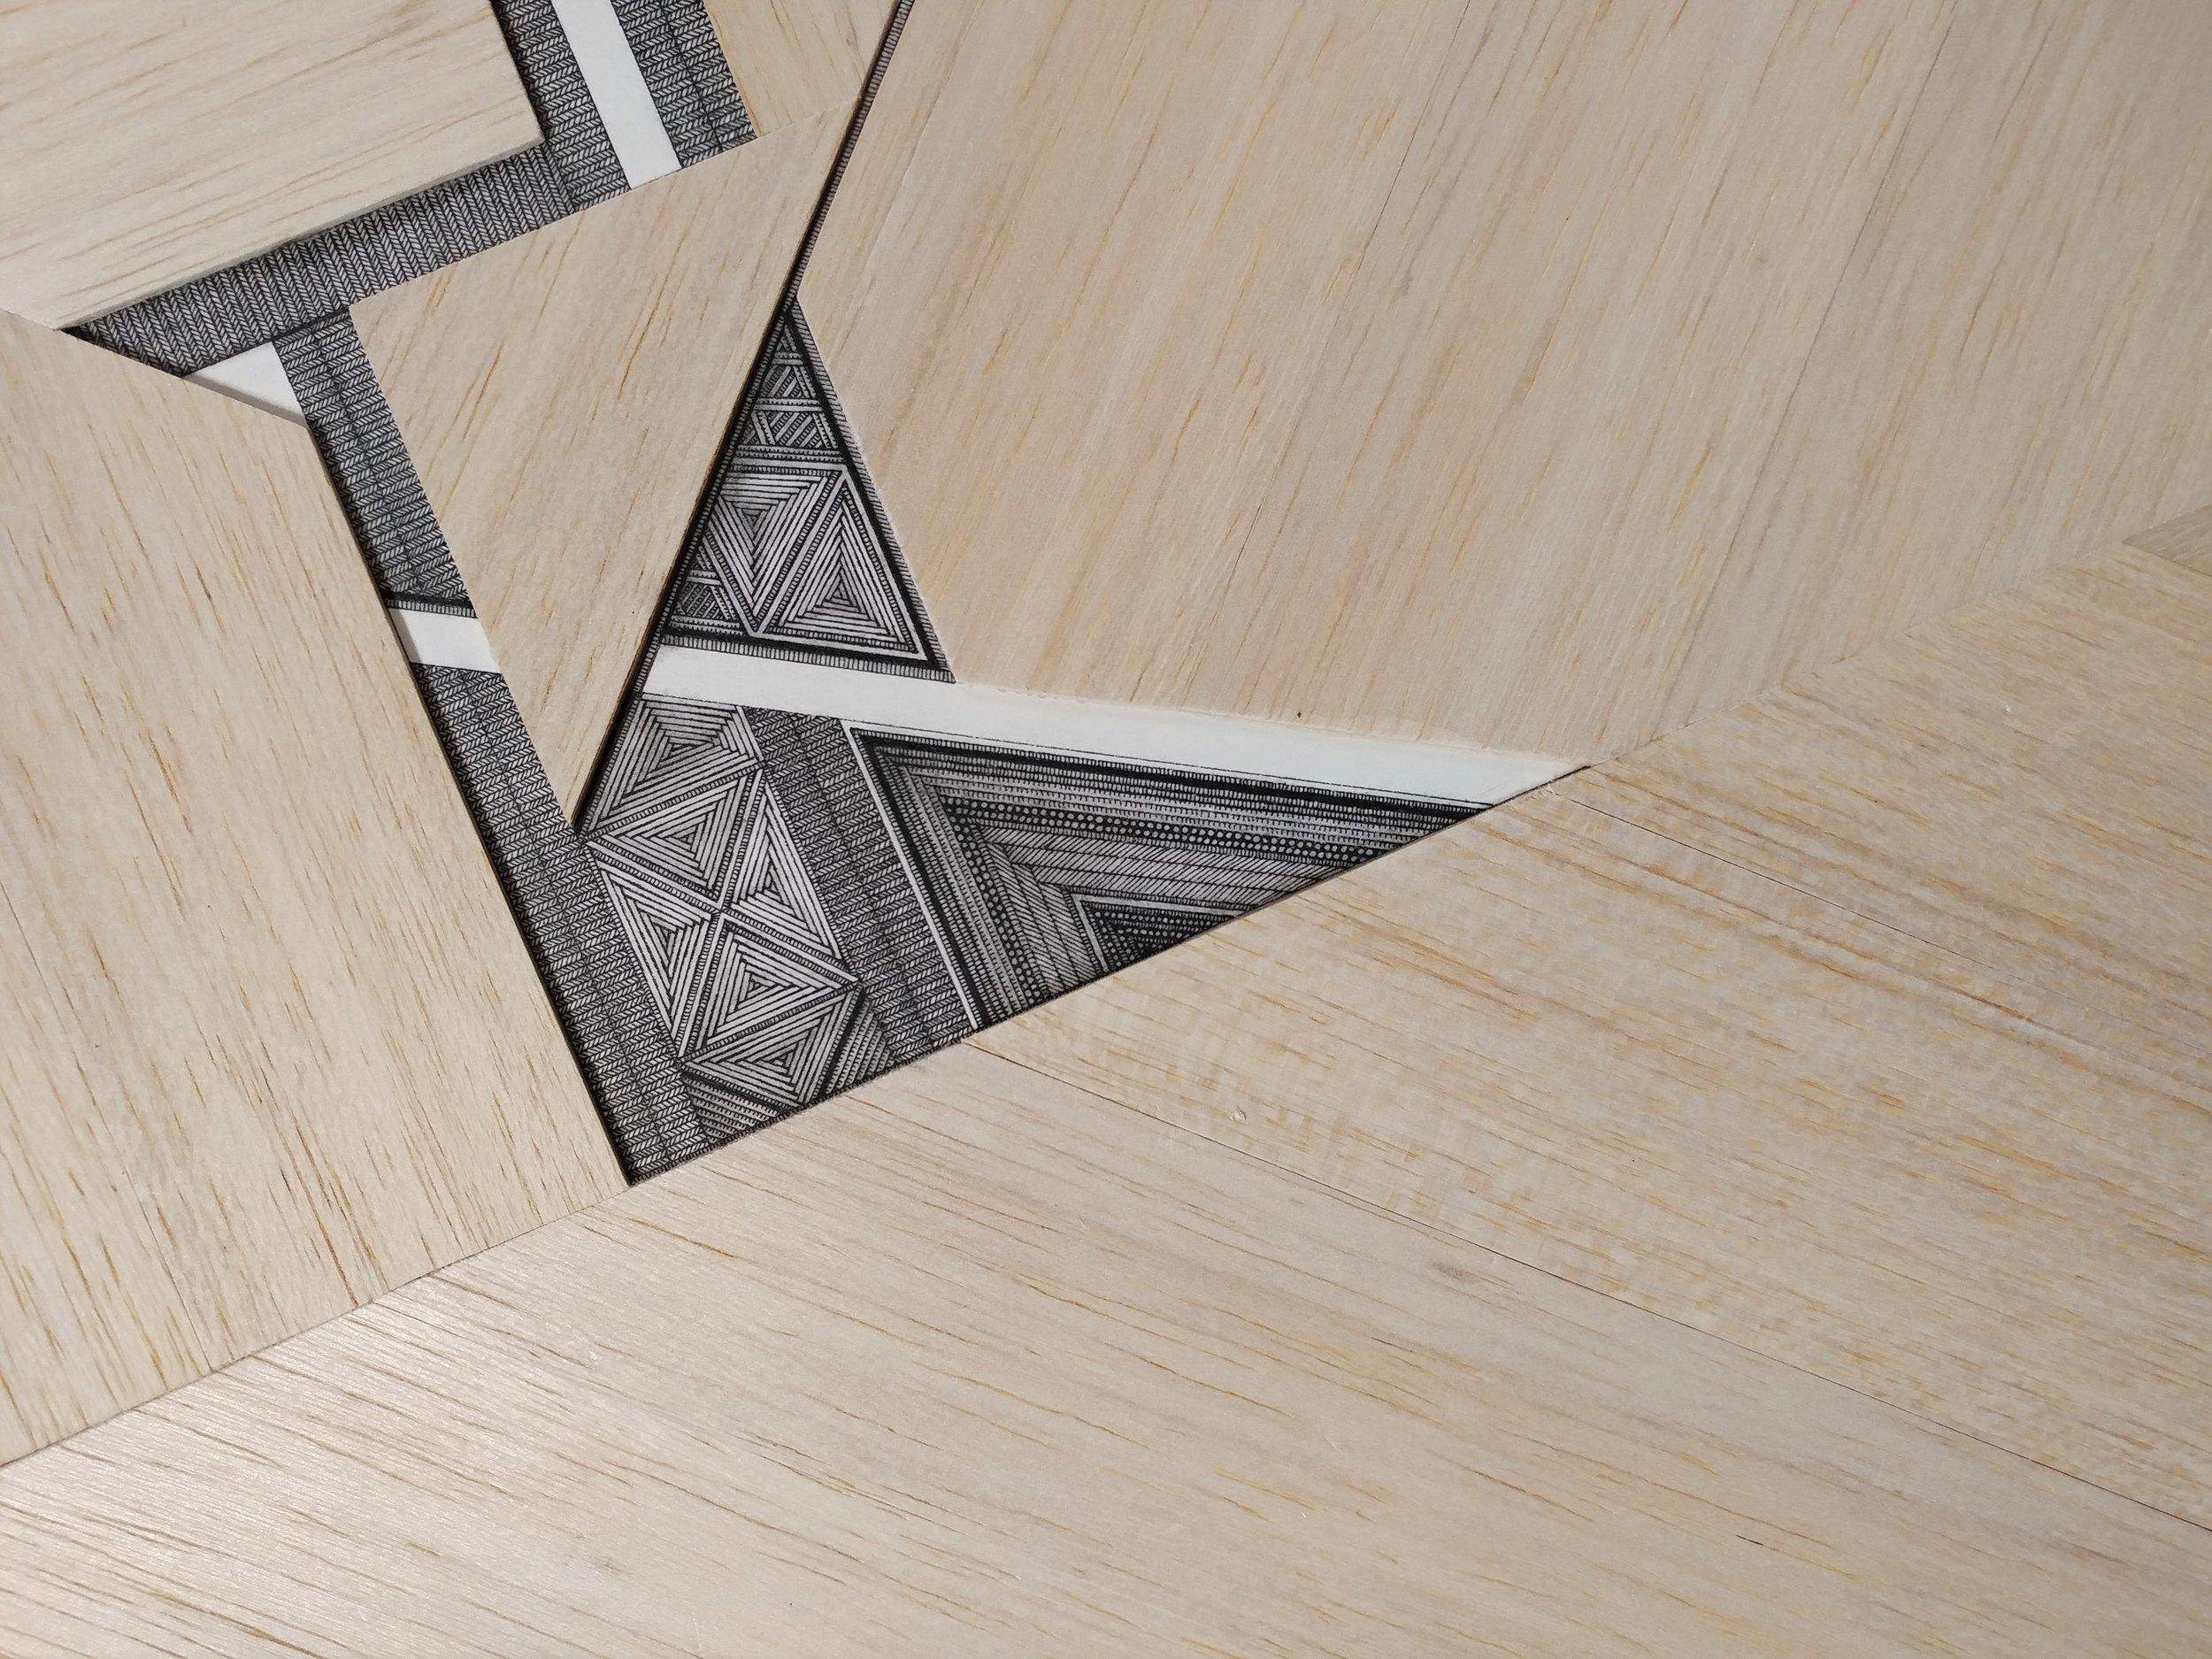 wooden_ink_1 (2).jpg